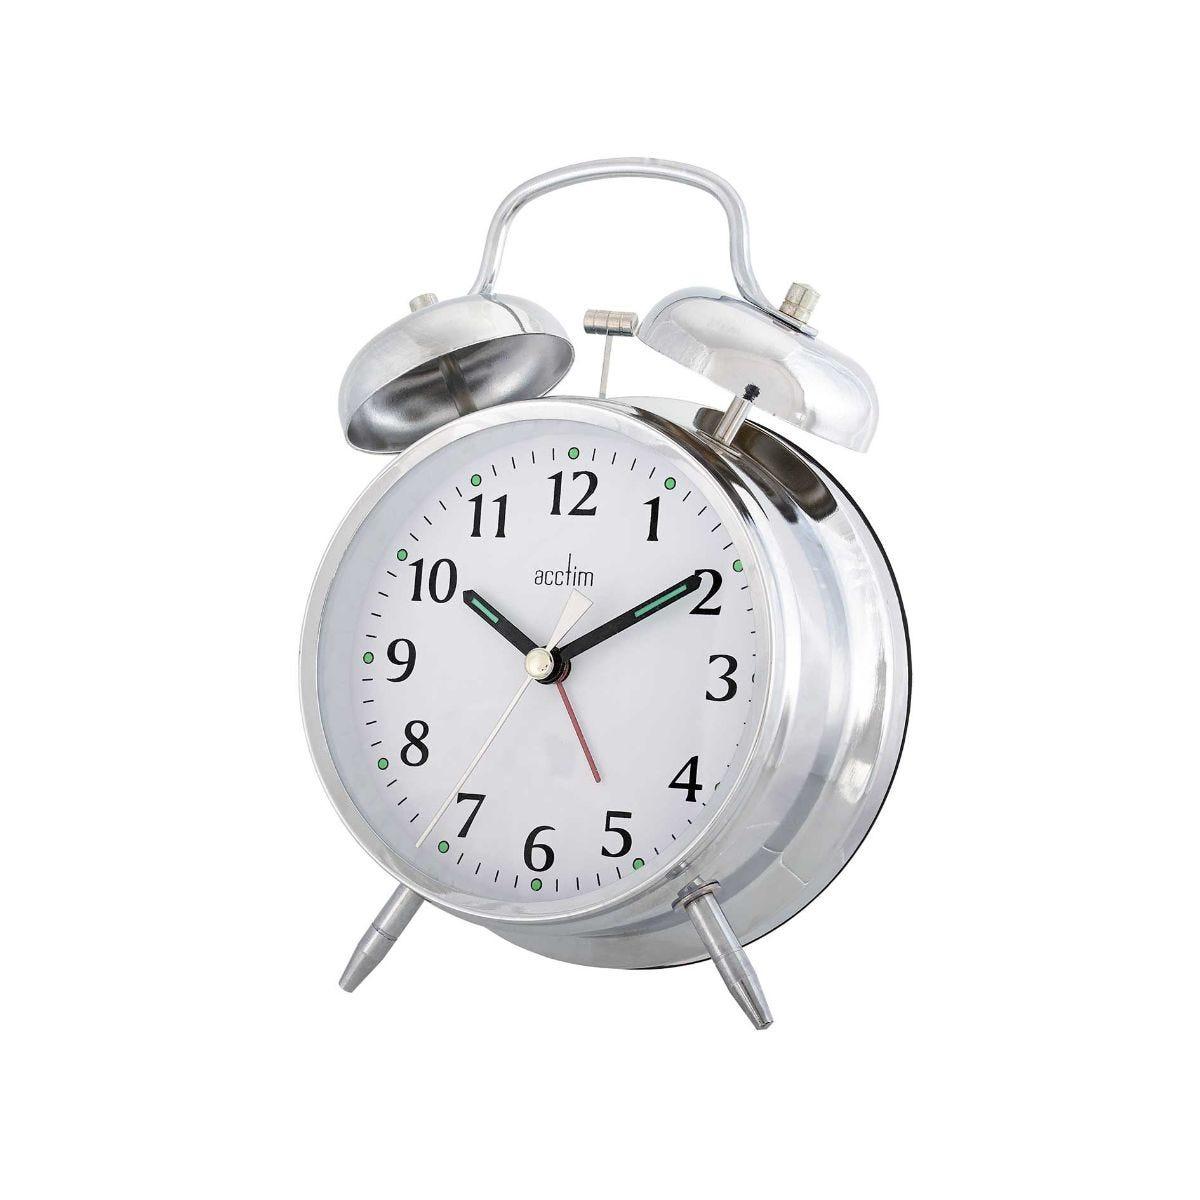 Image of Acctim Saxon Quartz Double Bell Alarm Clock Silver